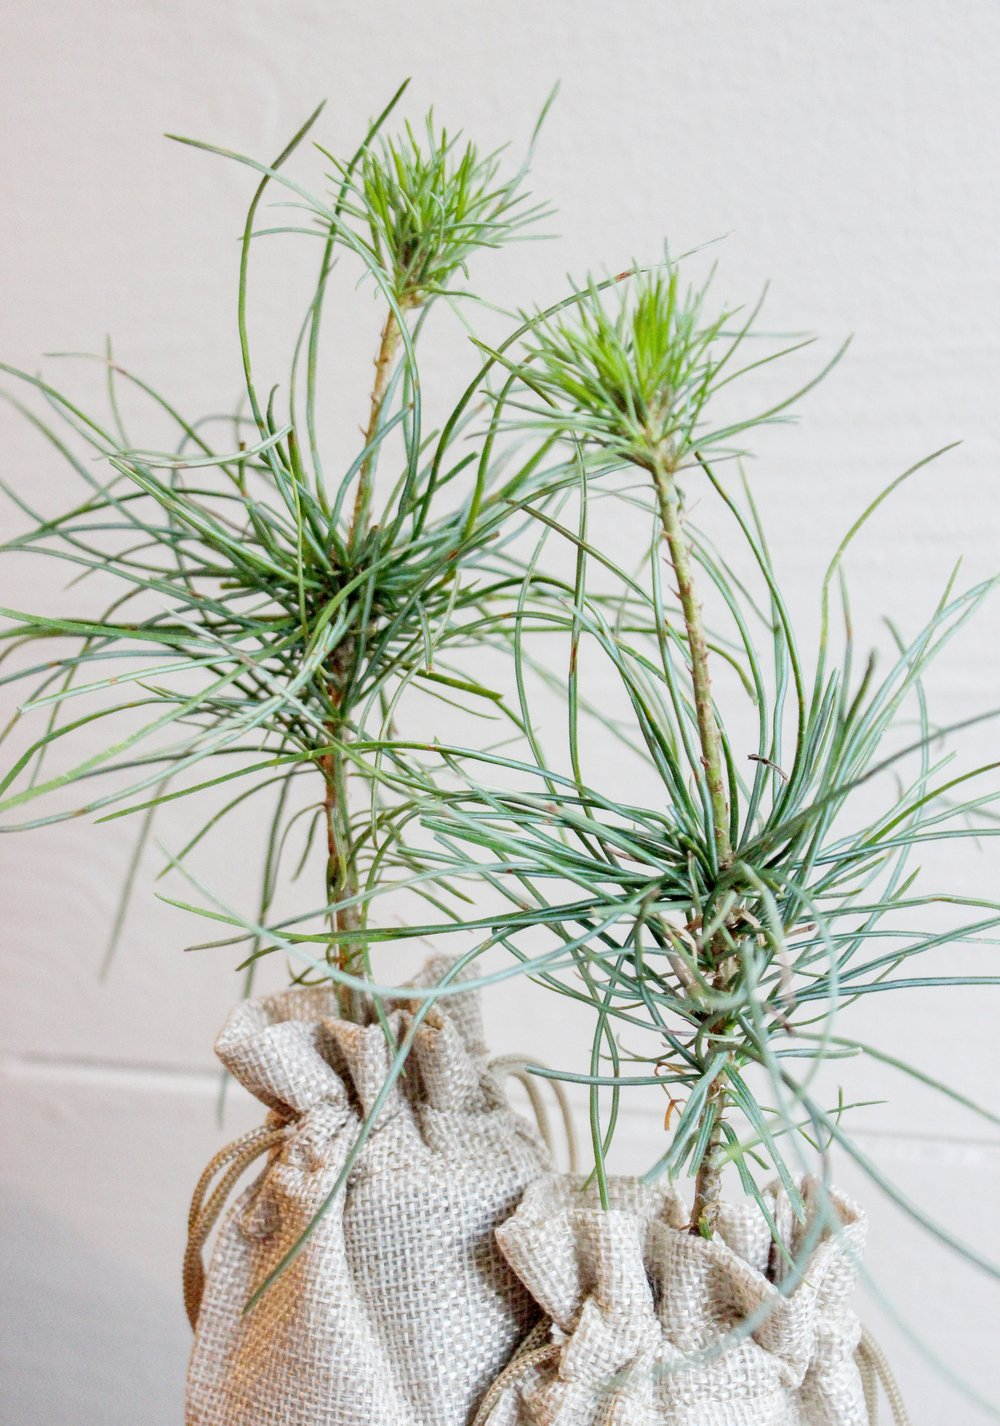 Little Saps - White Pine